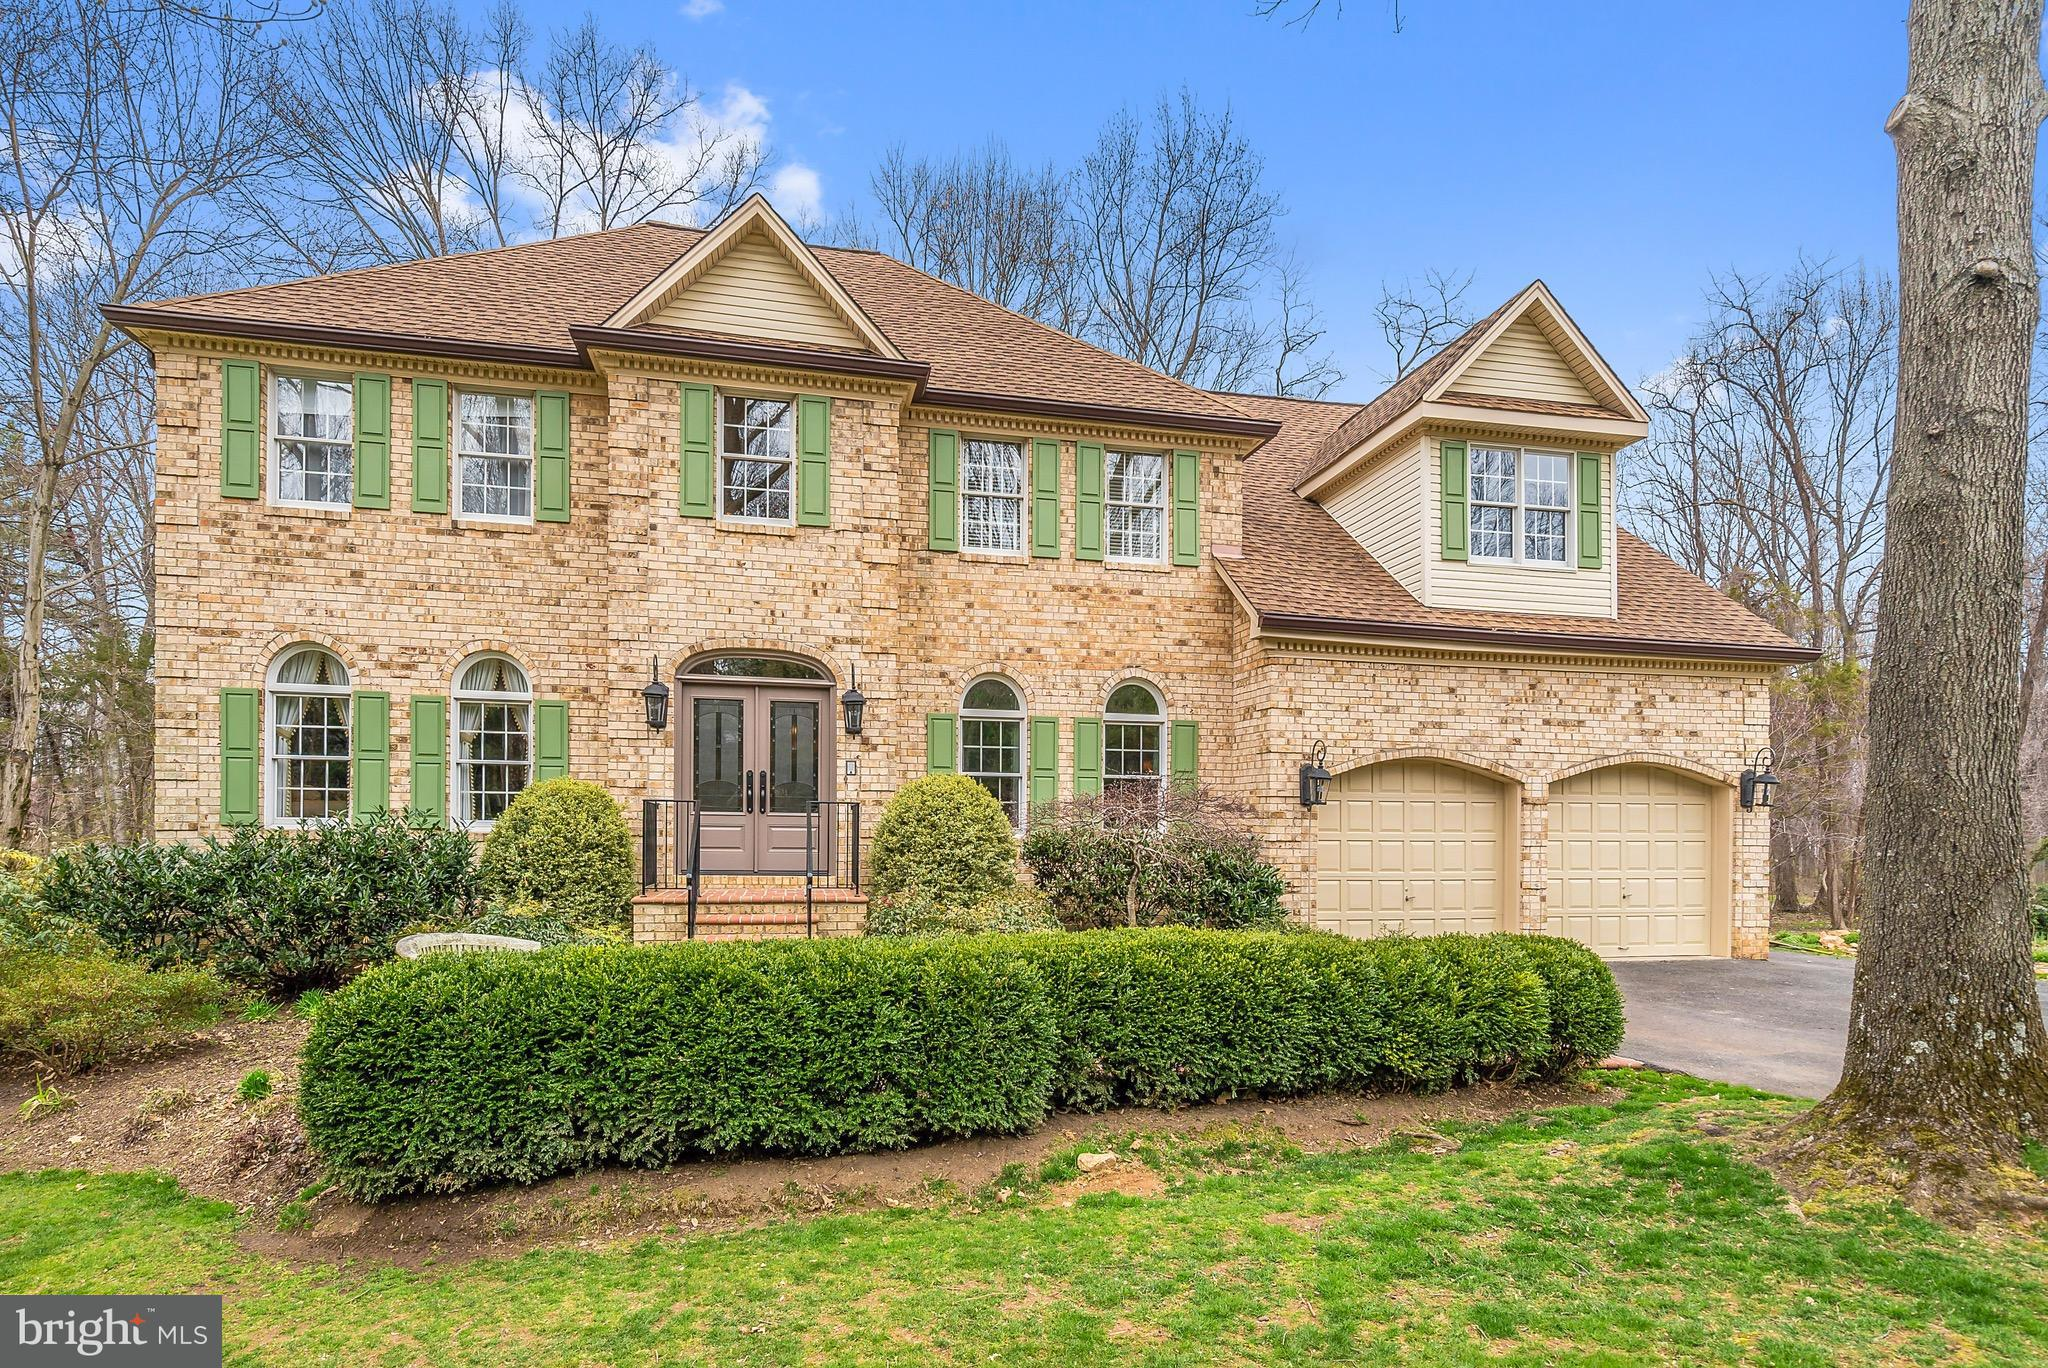 6886 WELL HOUSE DRIVE, Warrenton, VA 20187